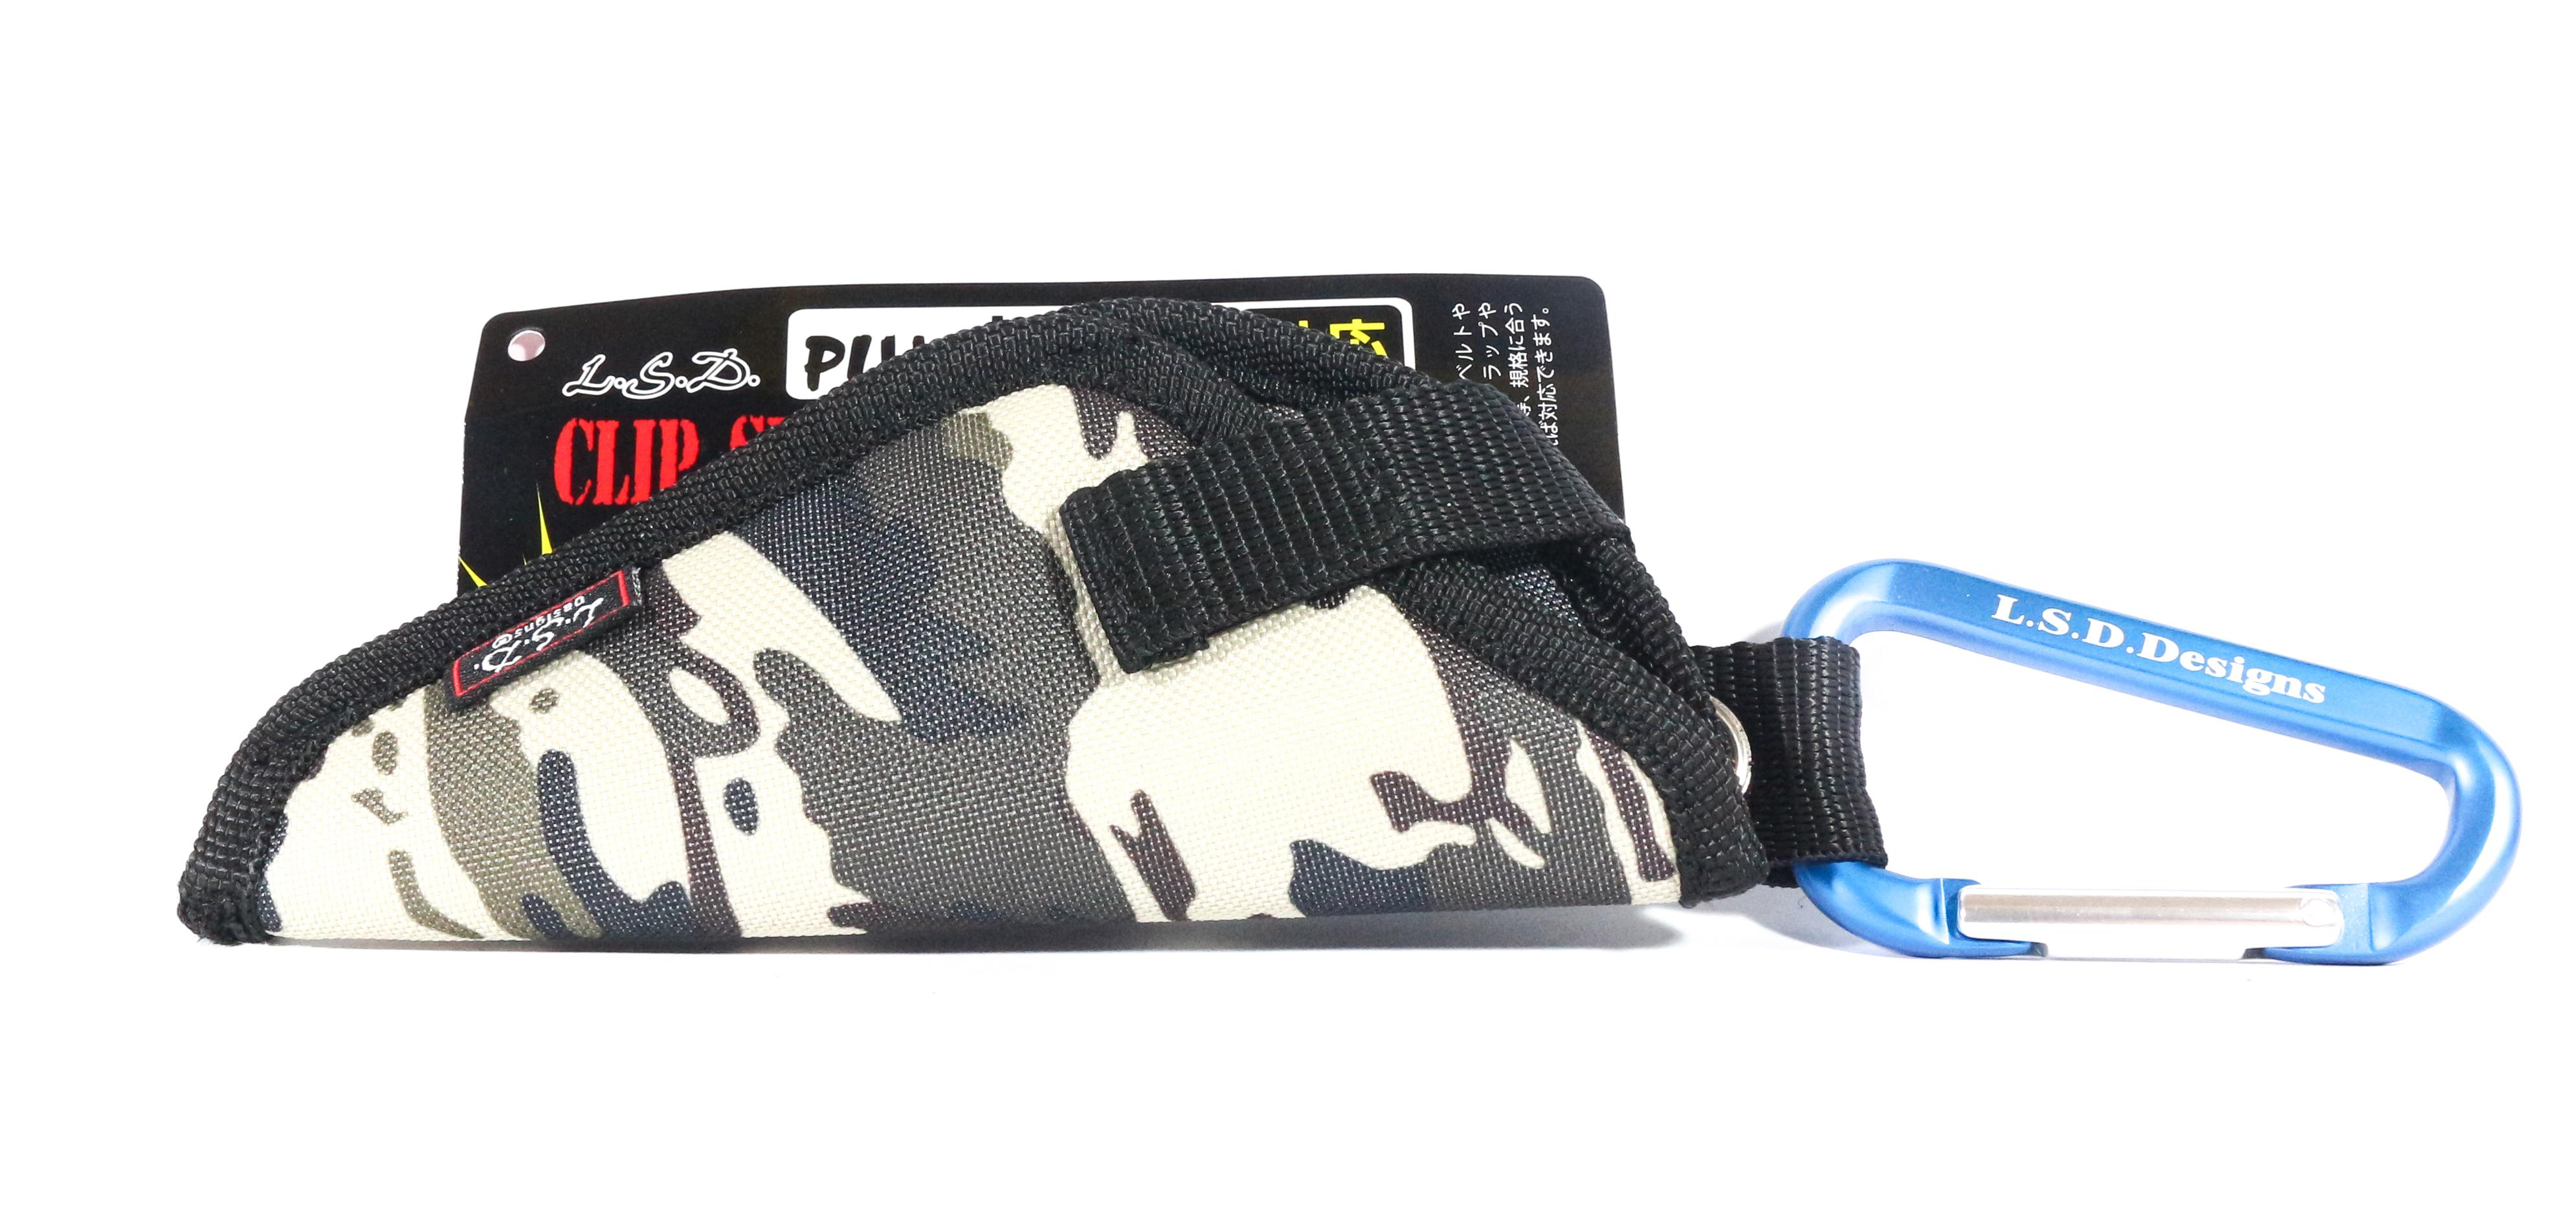 LSD Clip Shot Plier Holder Size S Camo 16 x 6.5 cm (9649)